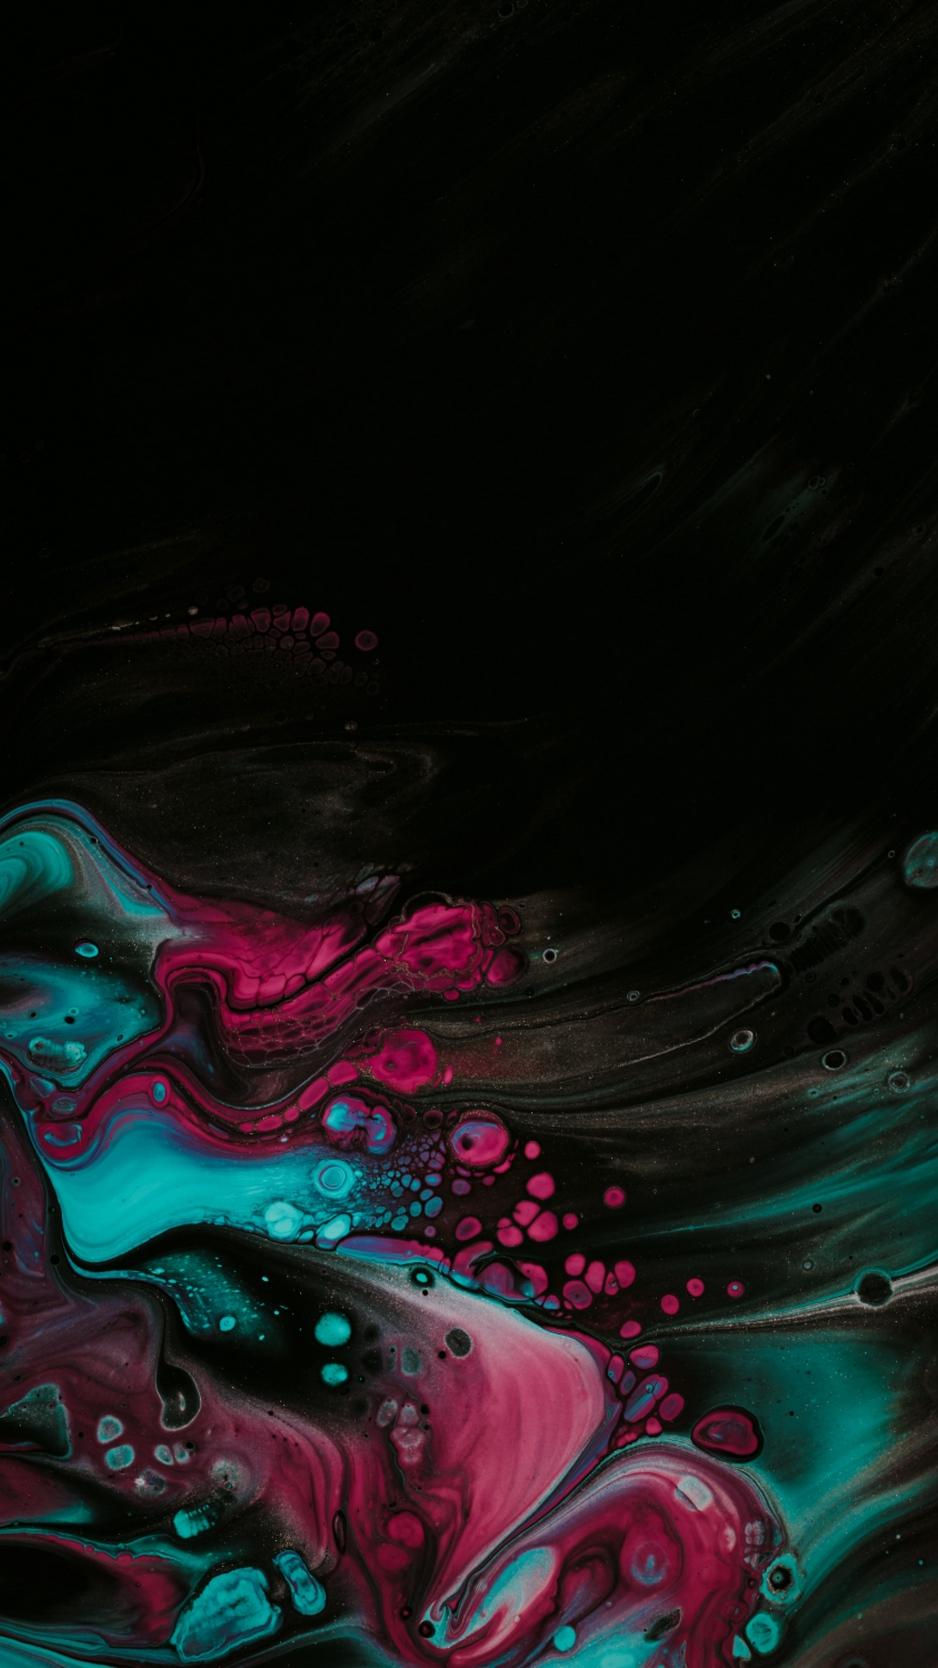 Wallpaper Paint, Spots, Stains, Mix, Liquid, Colorful - Abstract Fluid Wallpaper 4k - HD Wallpaper